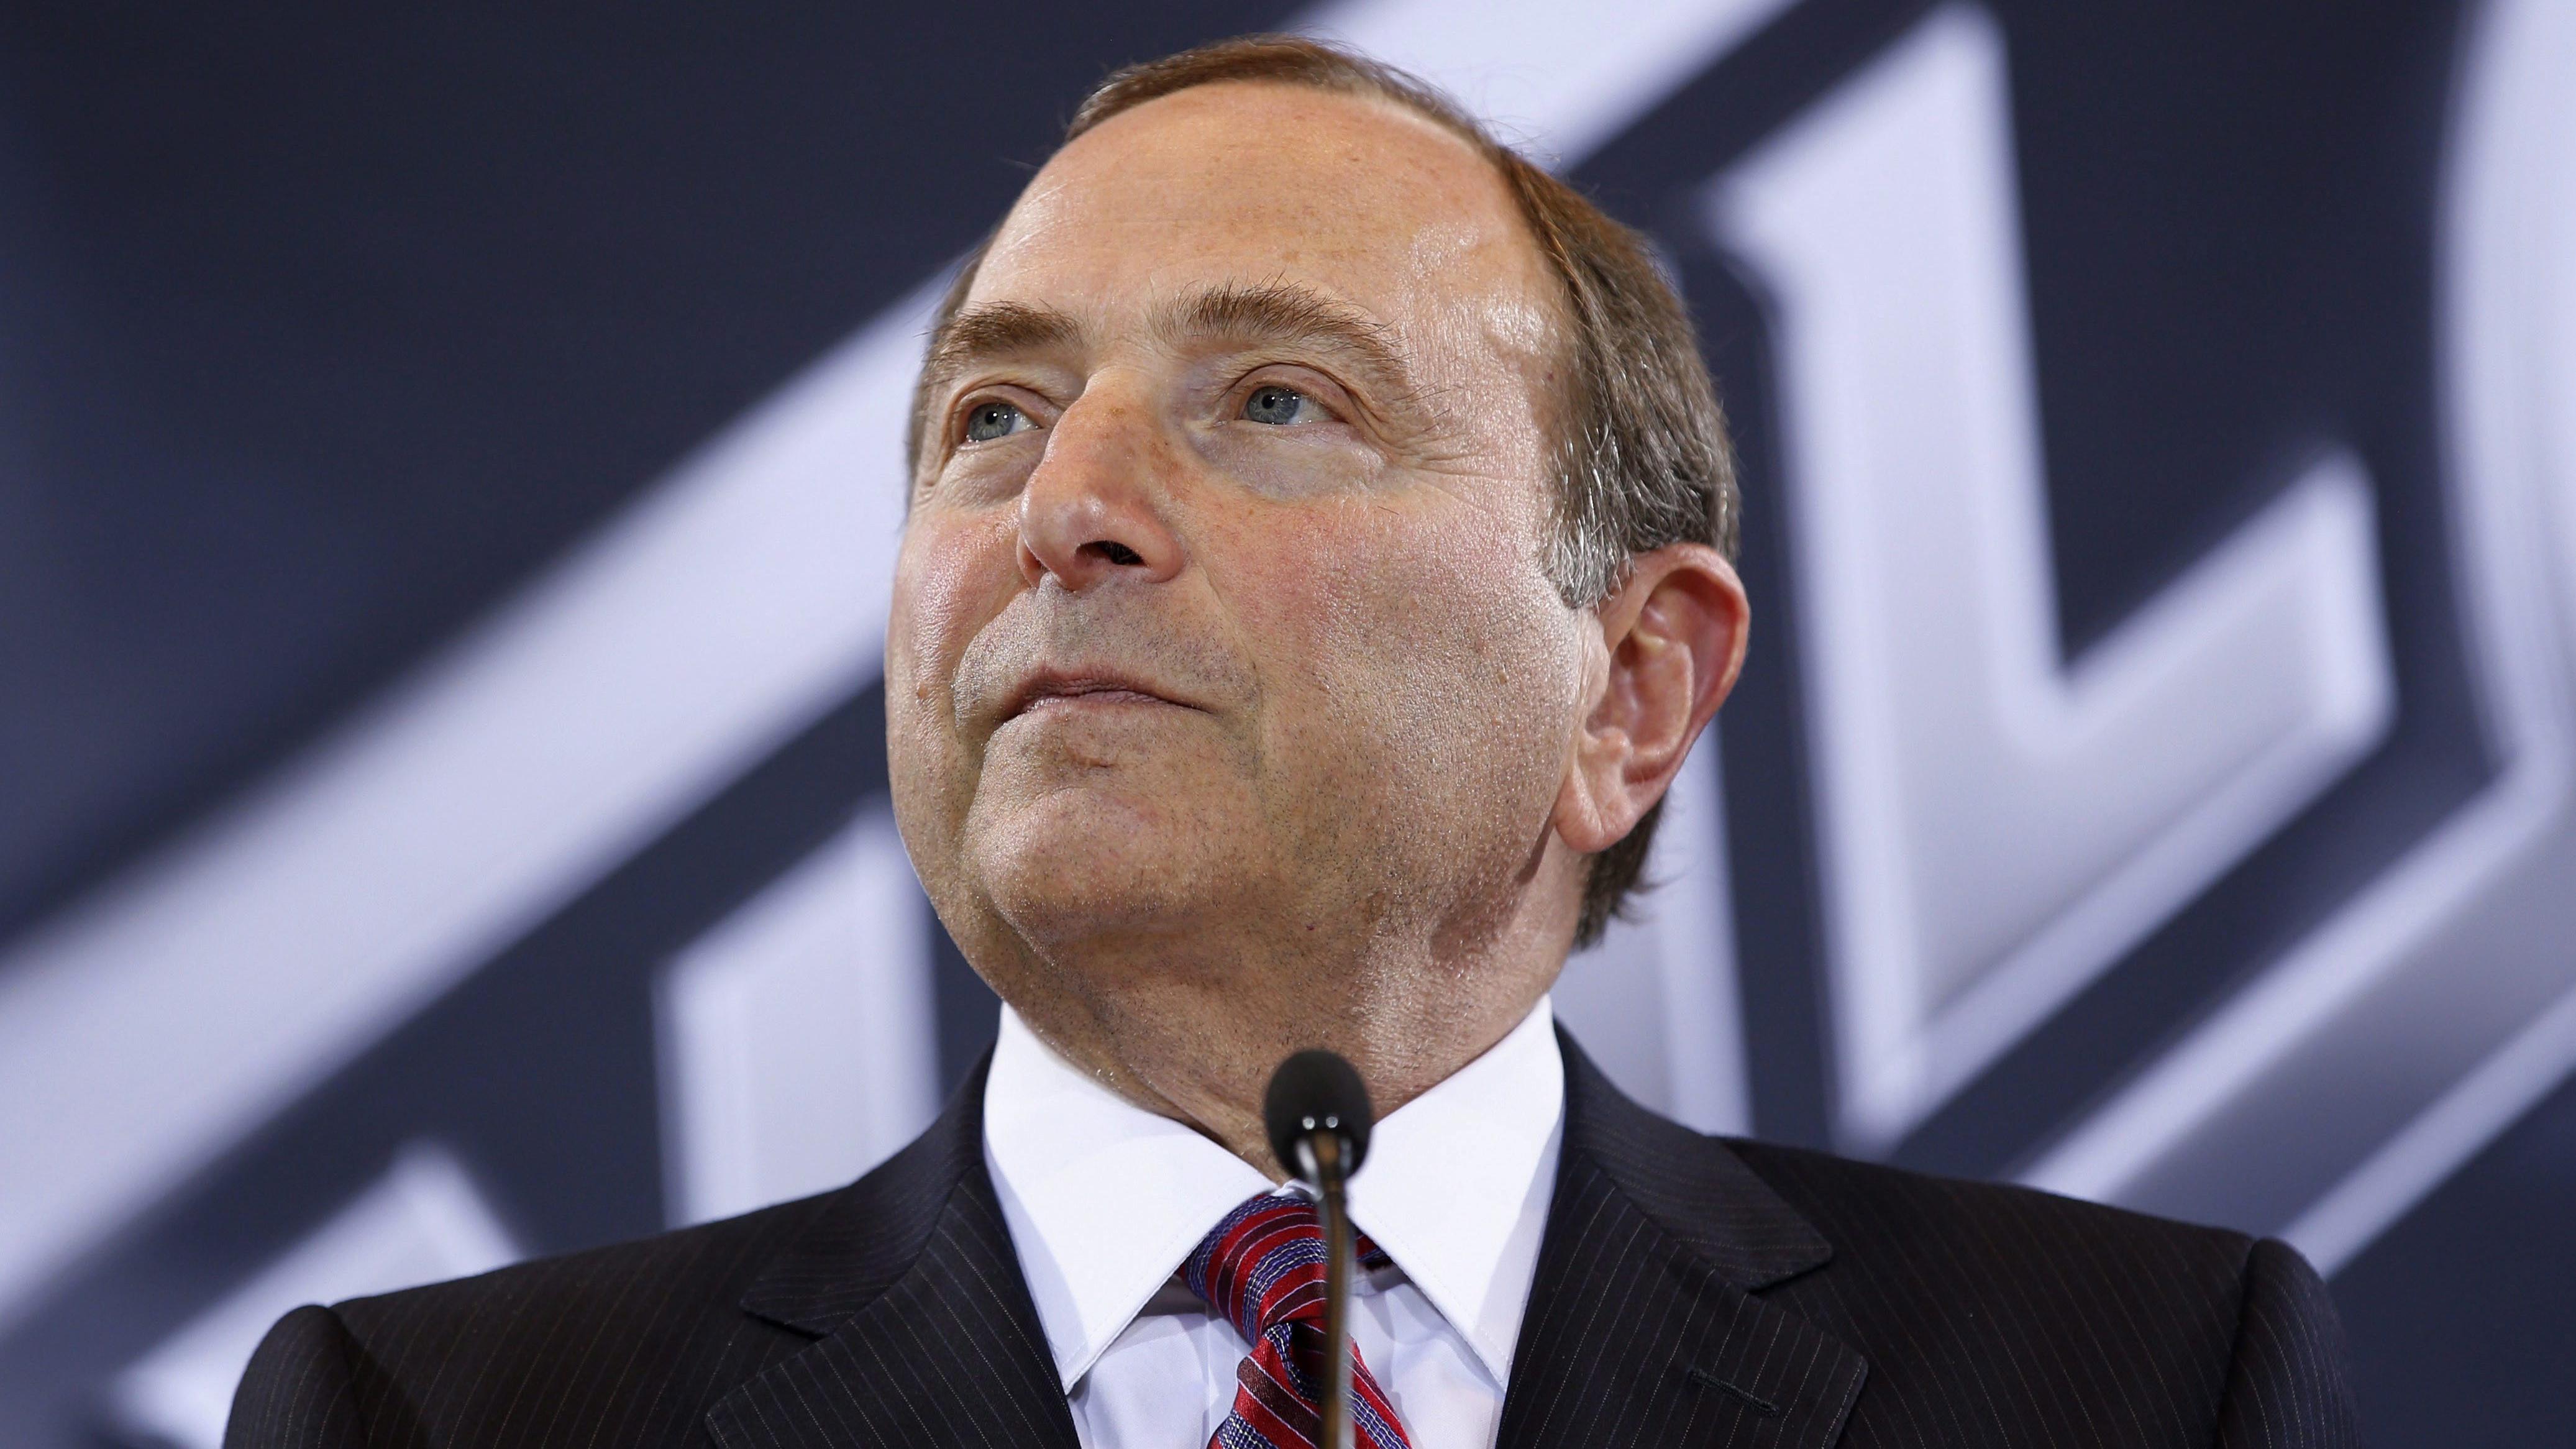 NHL delivers 'zero tolerance' plan in effort to change hockey culture